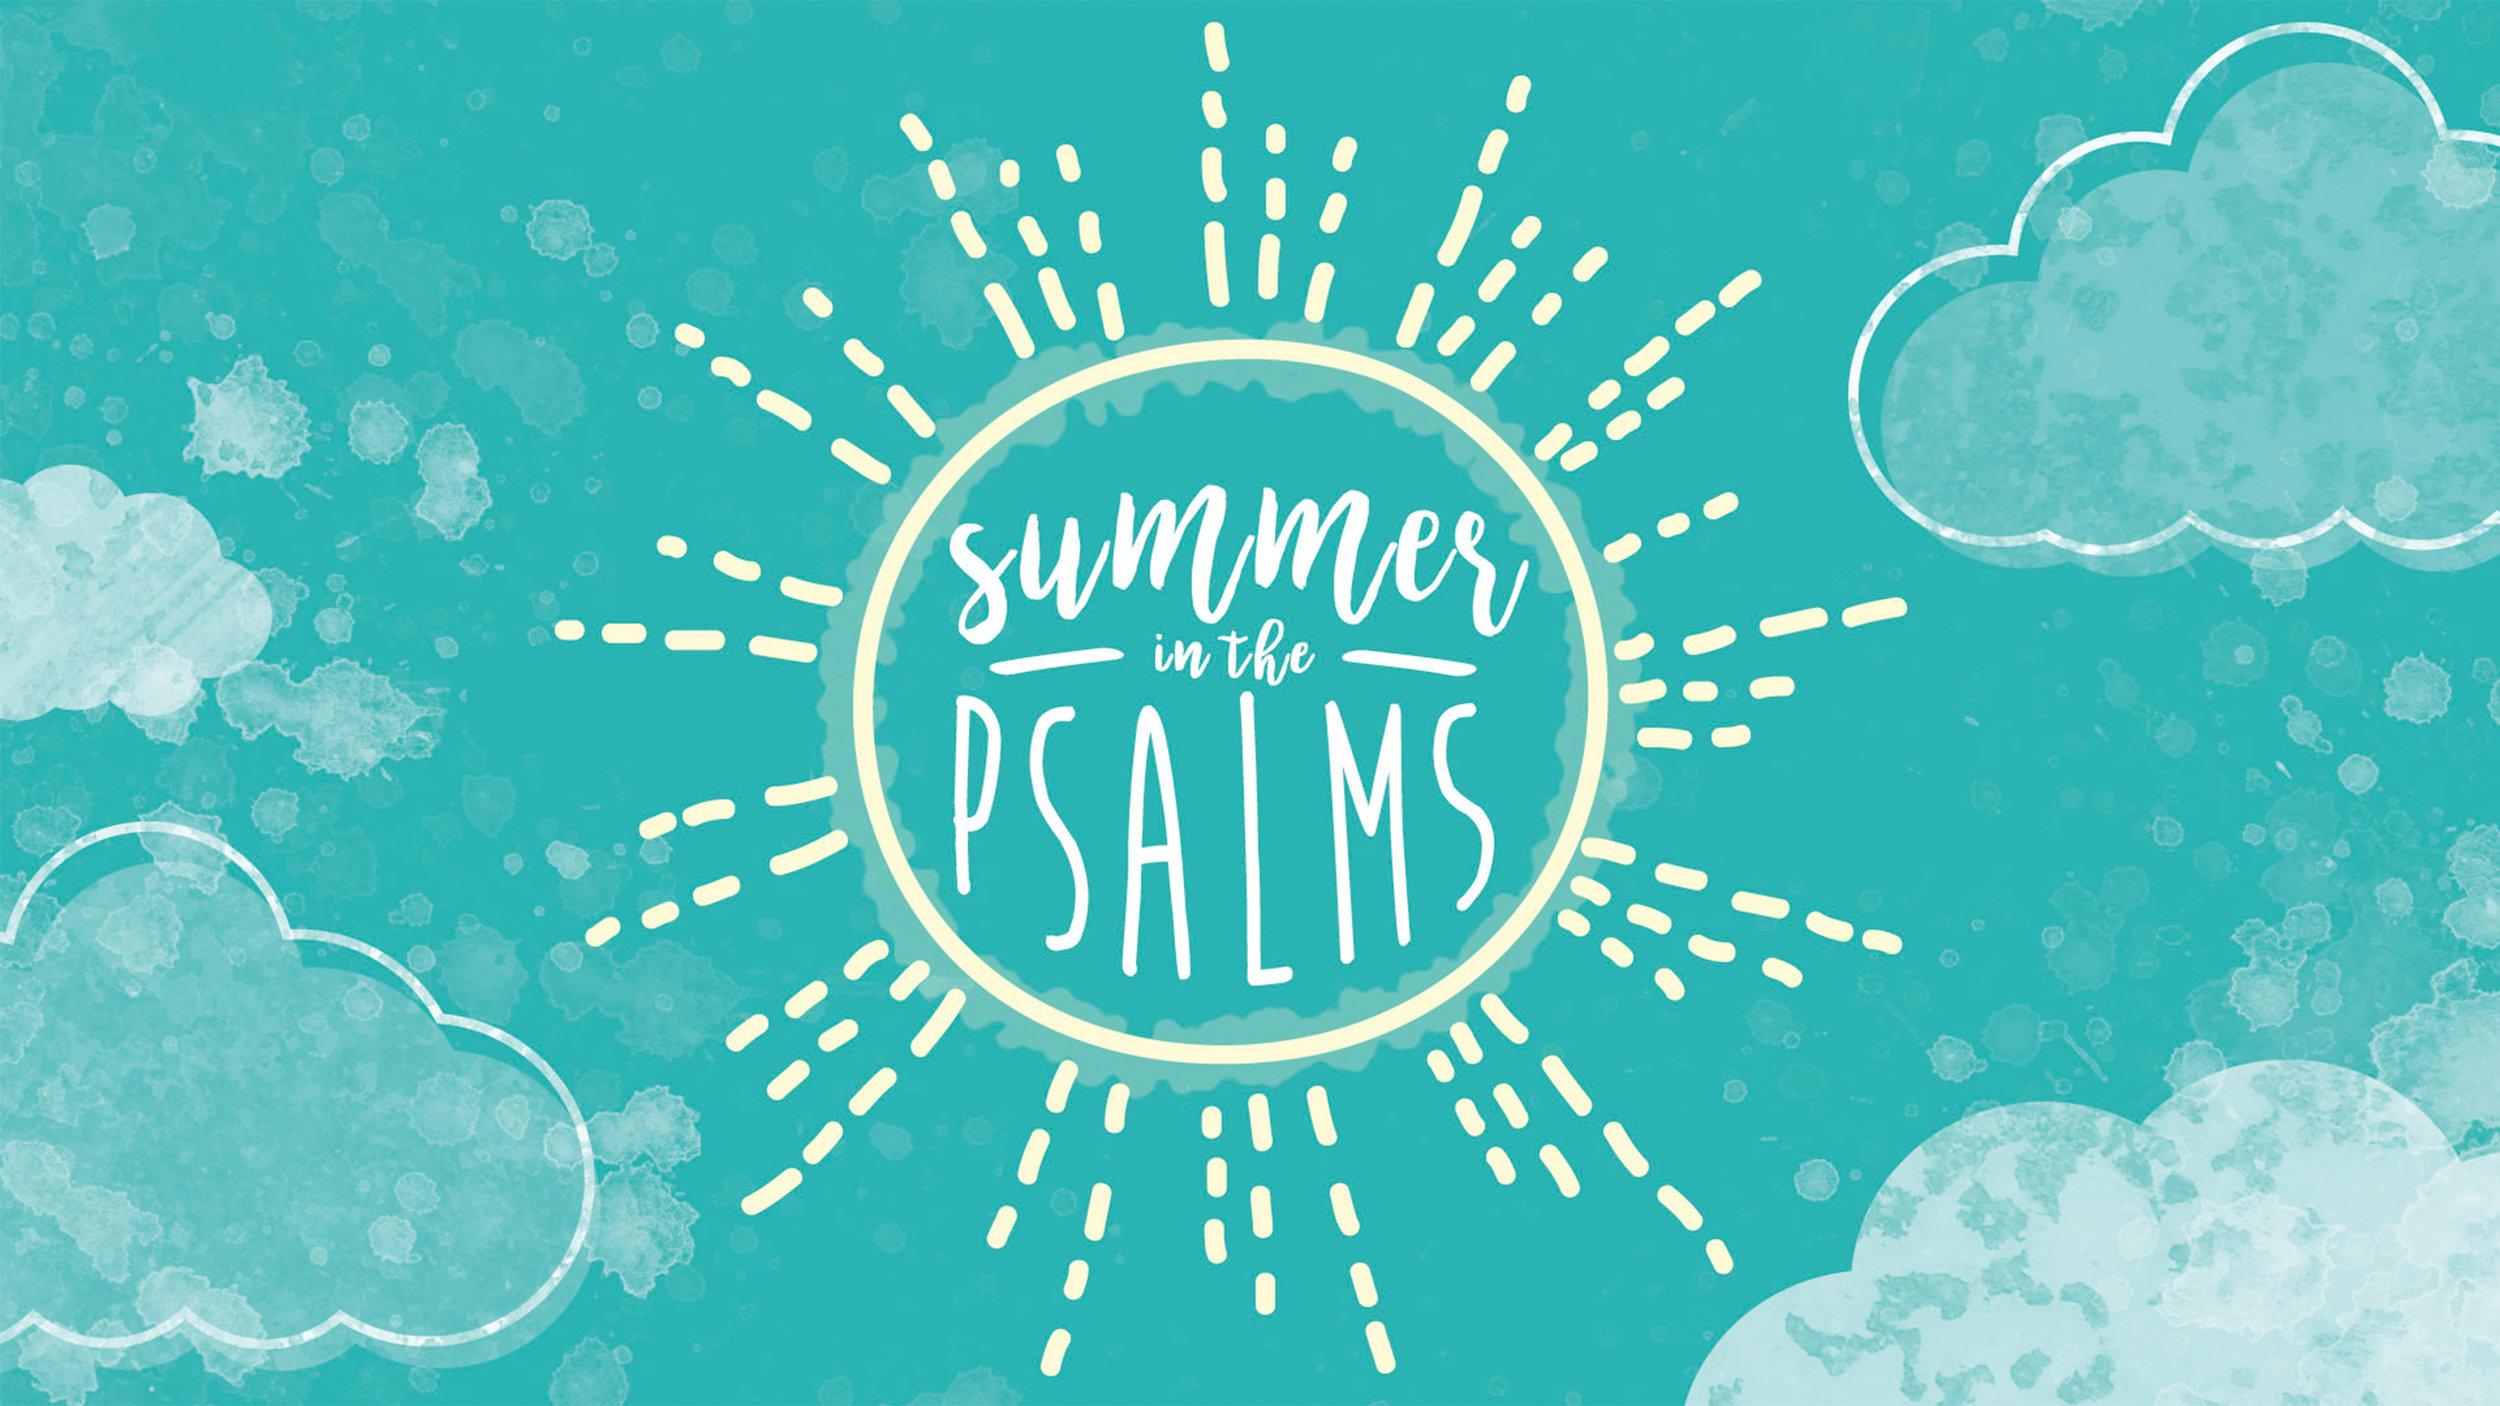 summer in the psalms SUN.jpg